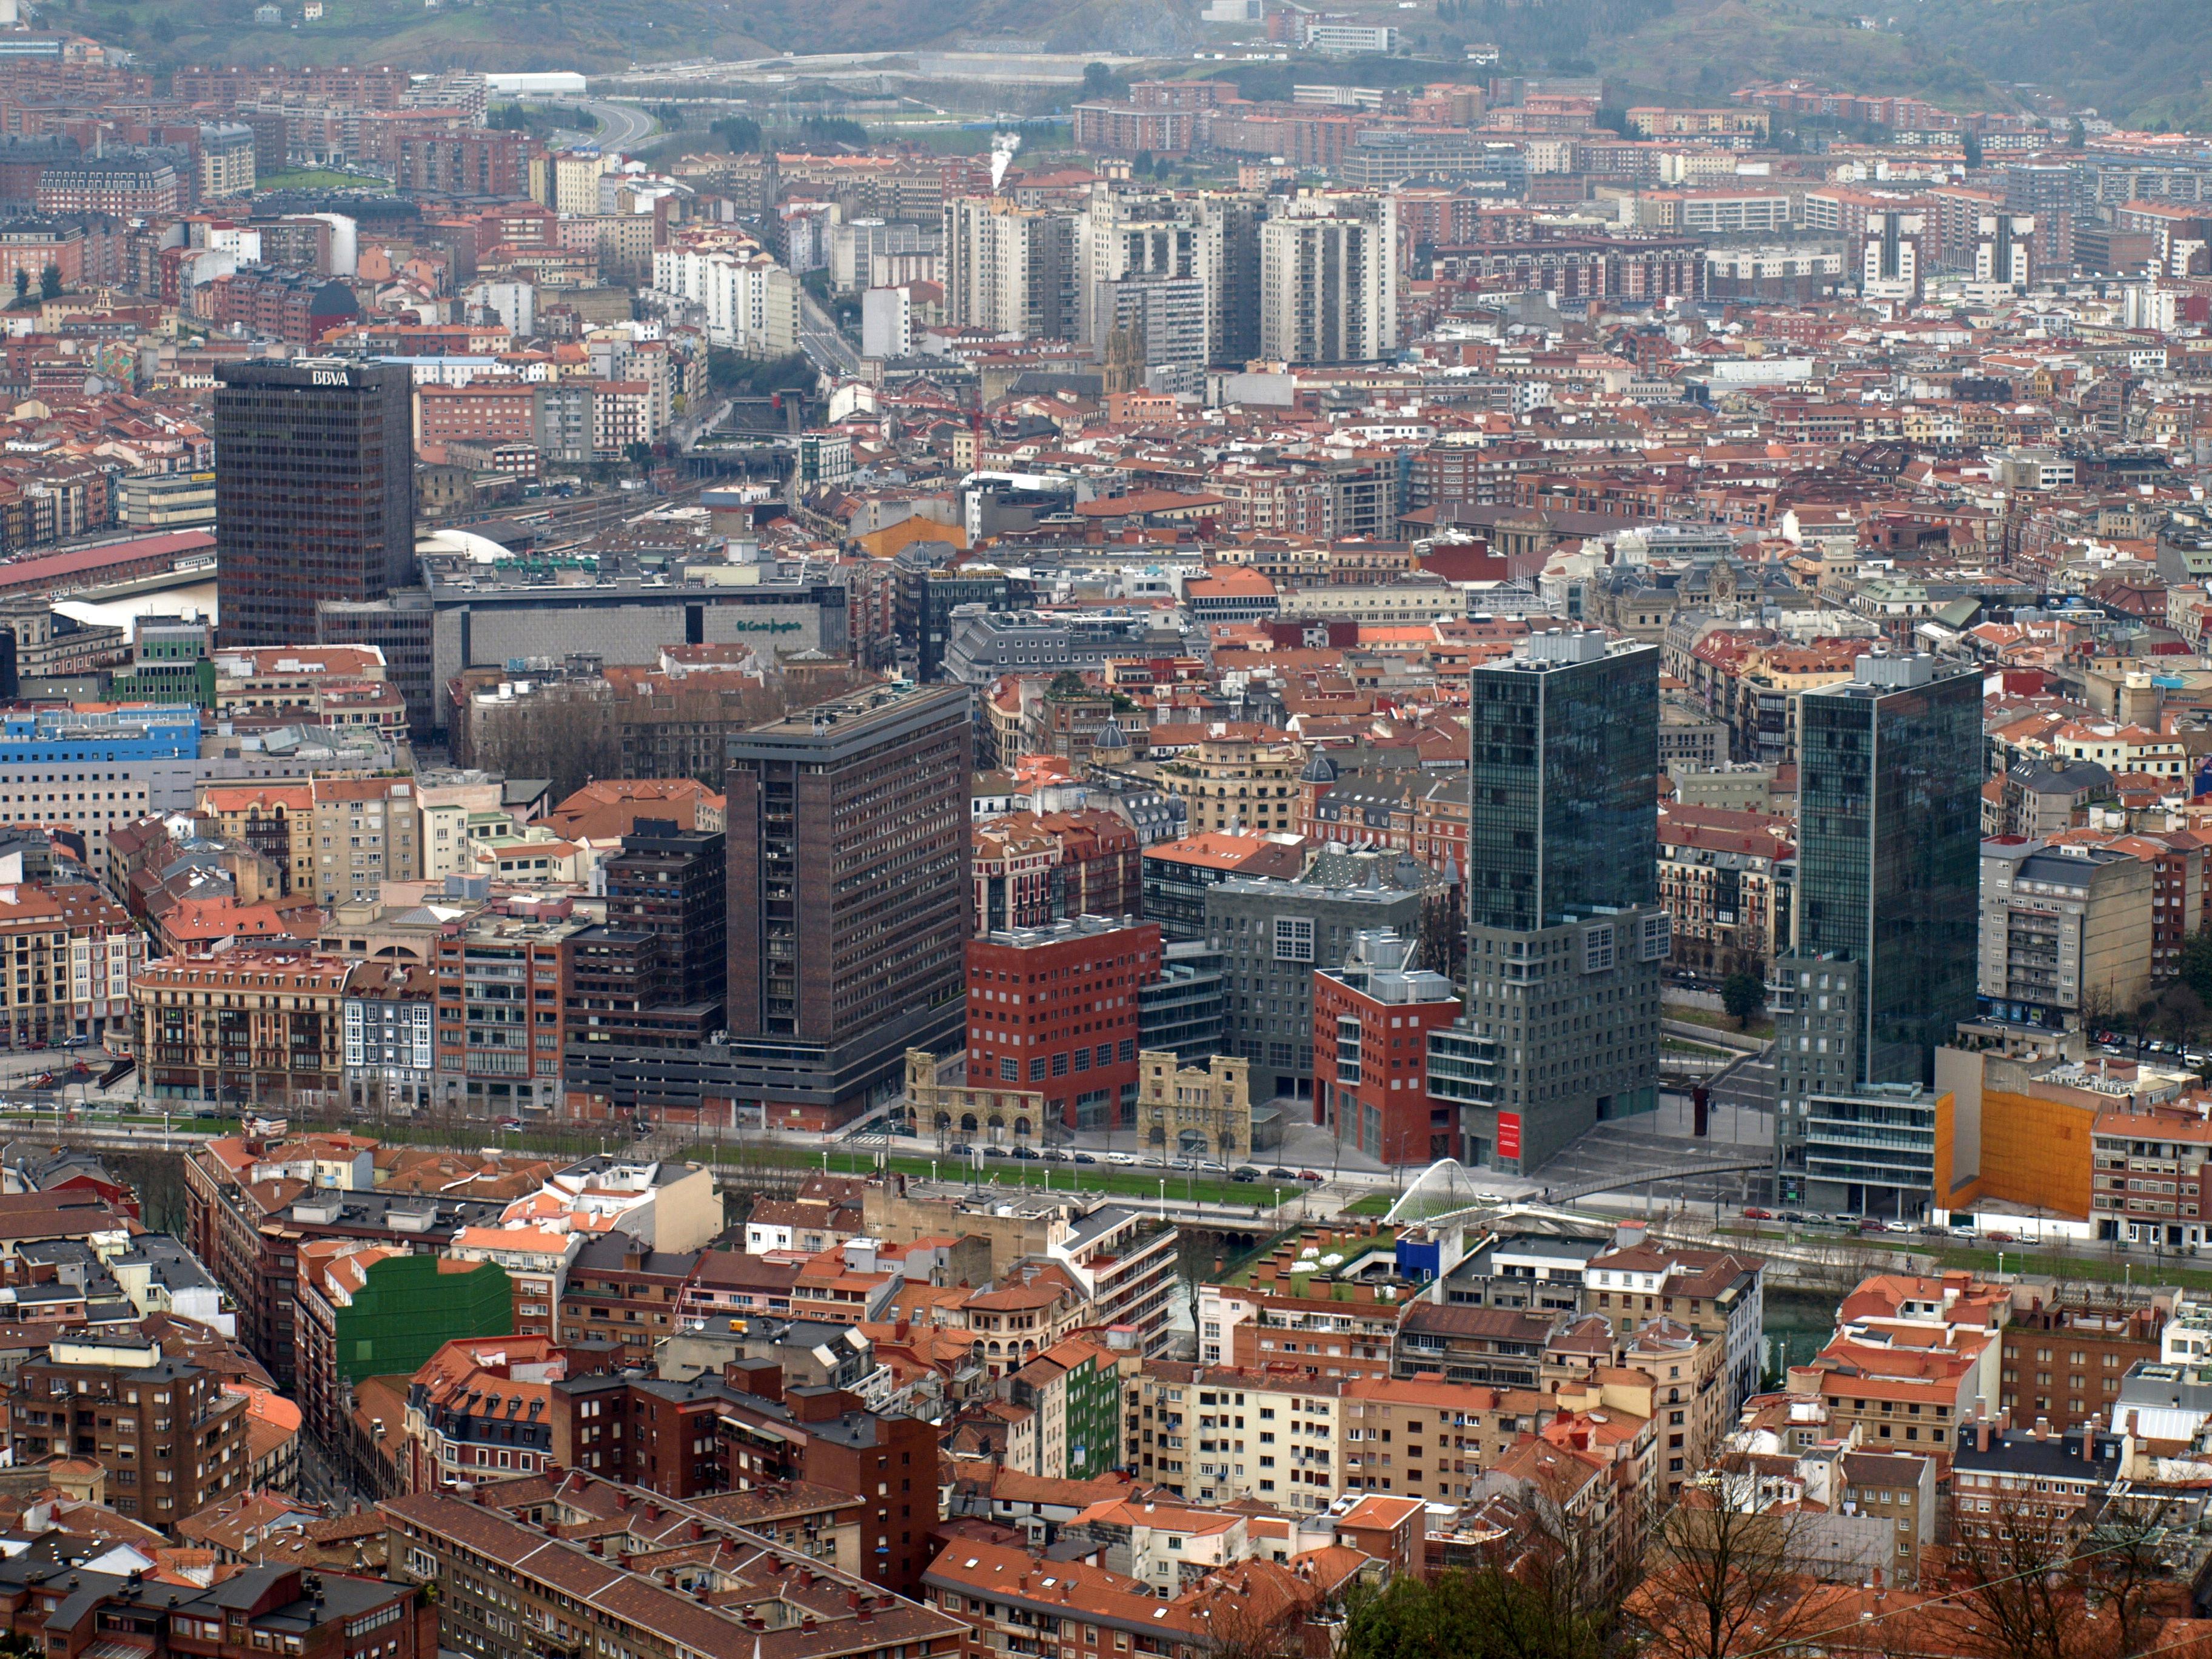 http://upload.wikimedia.org/wikipedia/commons/6/6c/Vista_de_Bilbao_(1).jpg